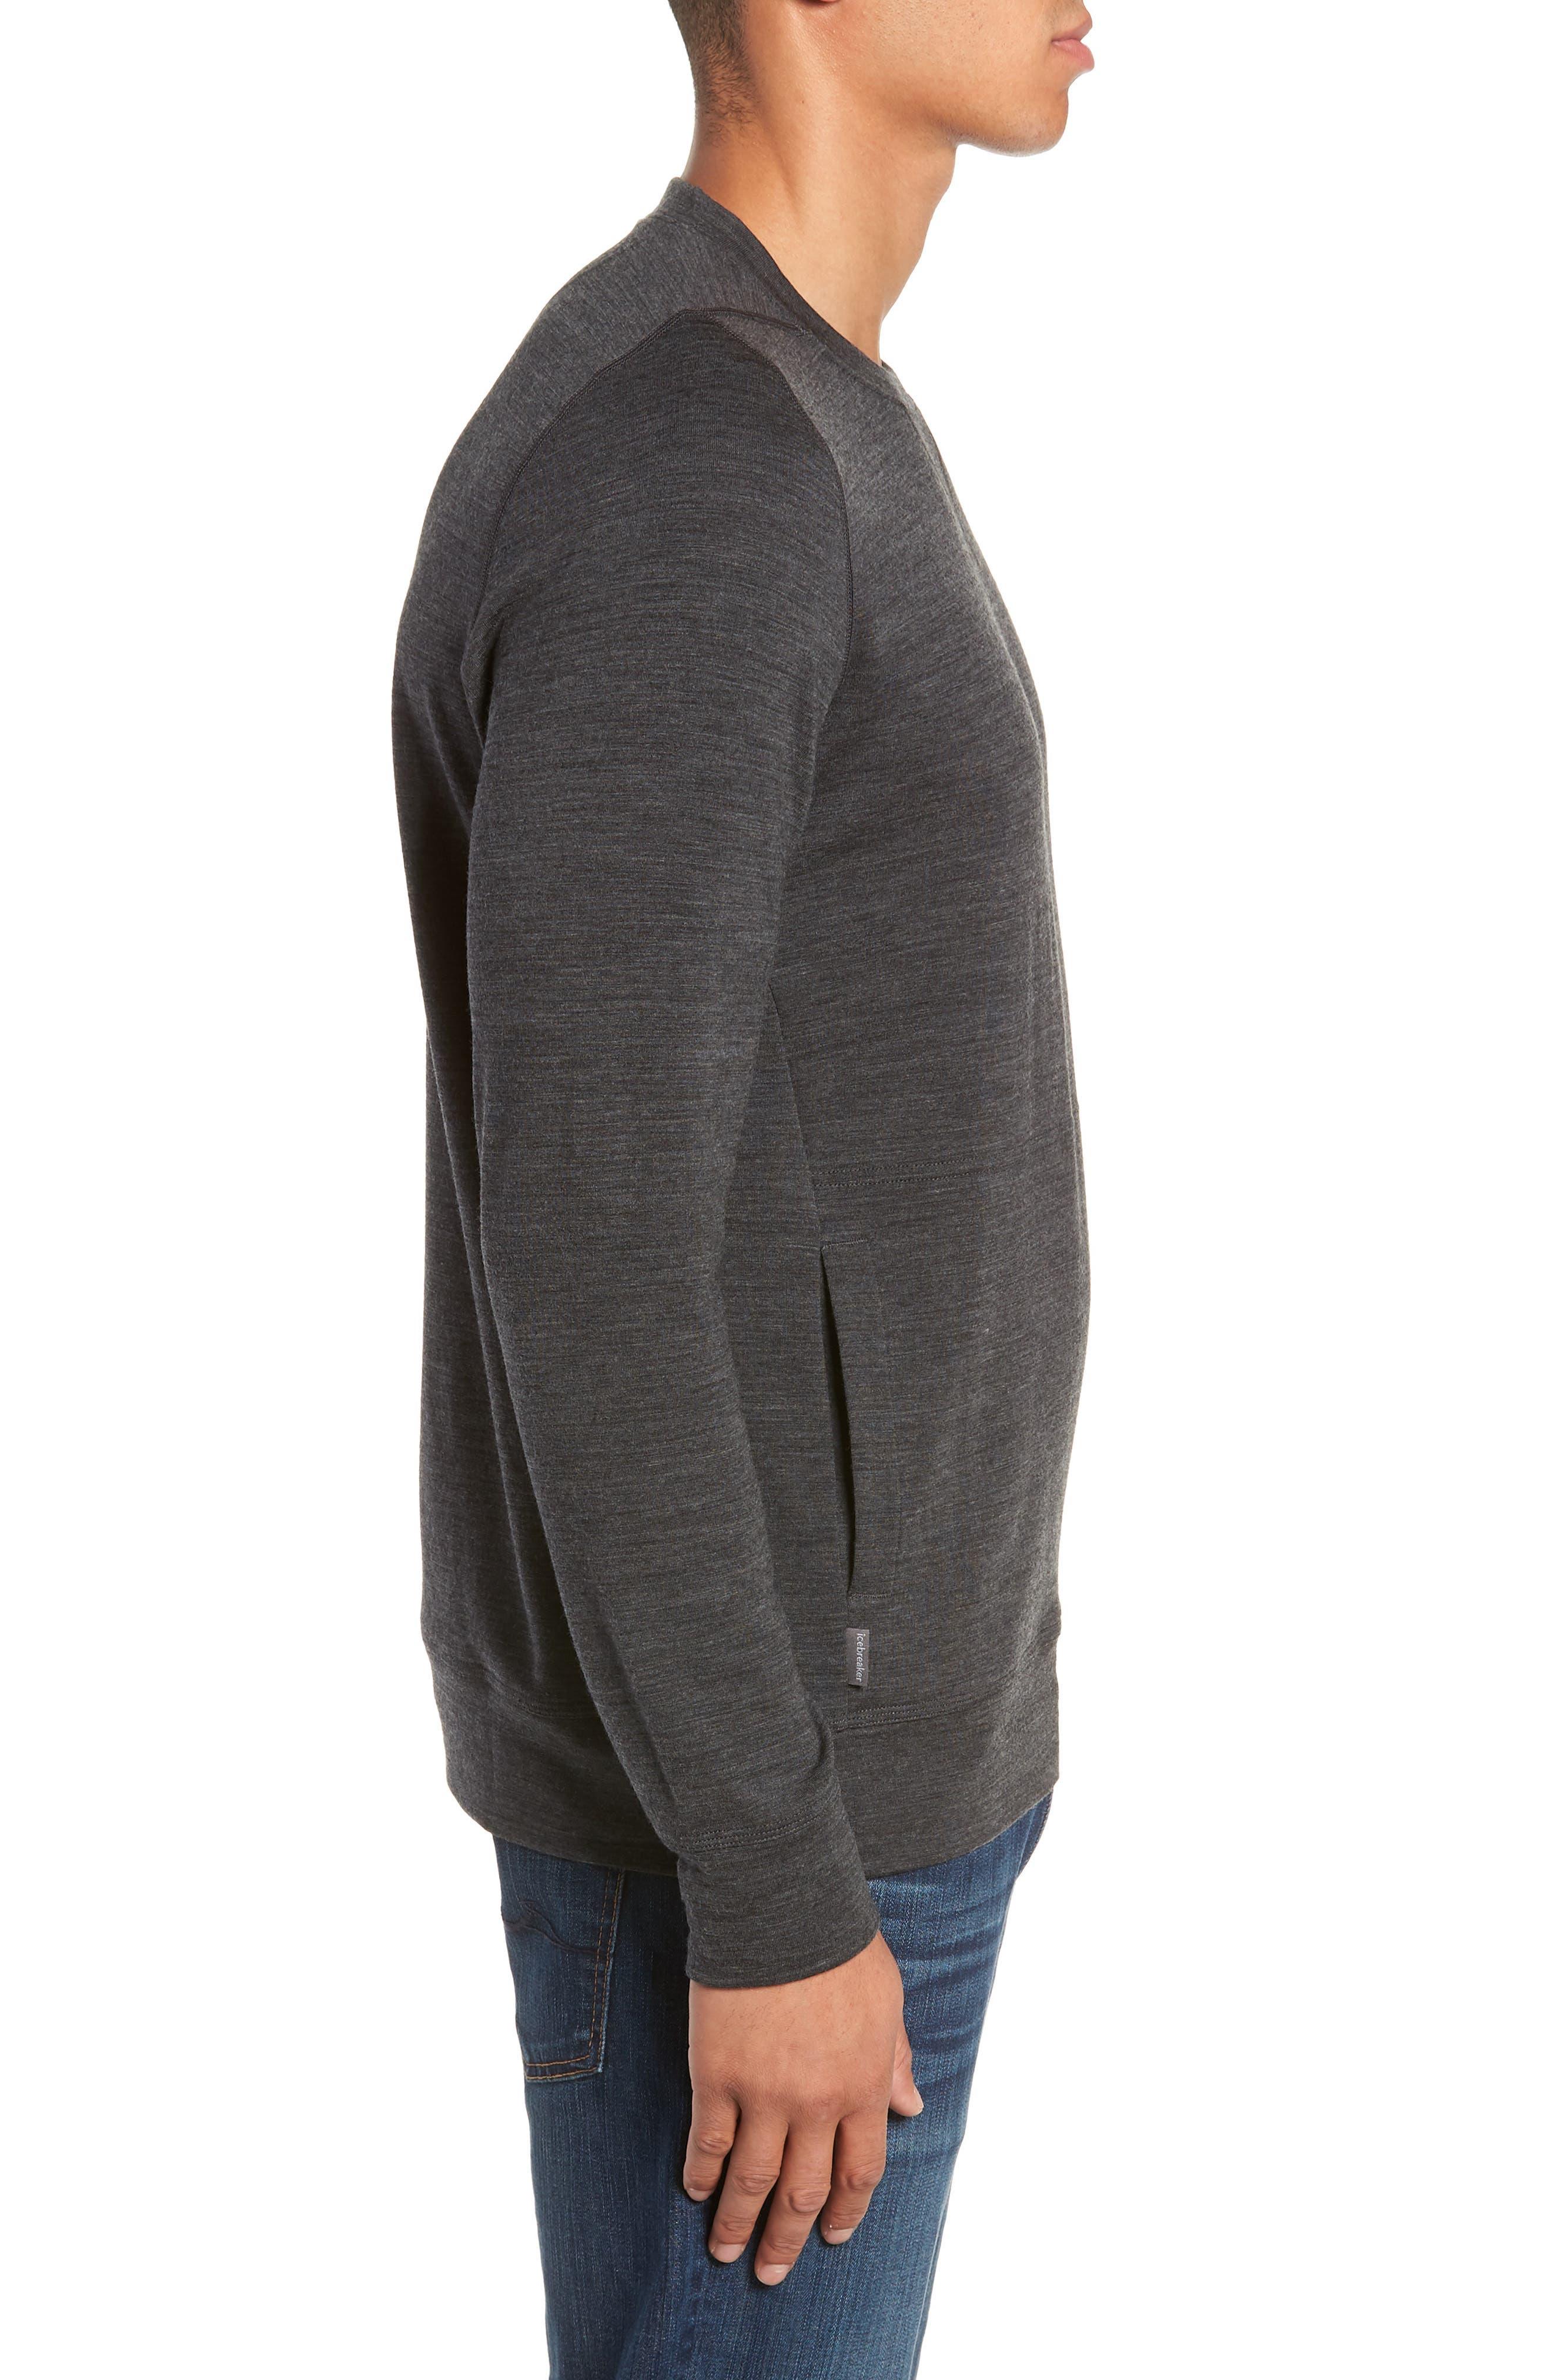 Shifter Merino Wool Blend Crewneck Sweater,                             Alternate thumbnail 3, color,                             JET HEATHER